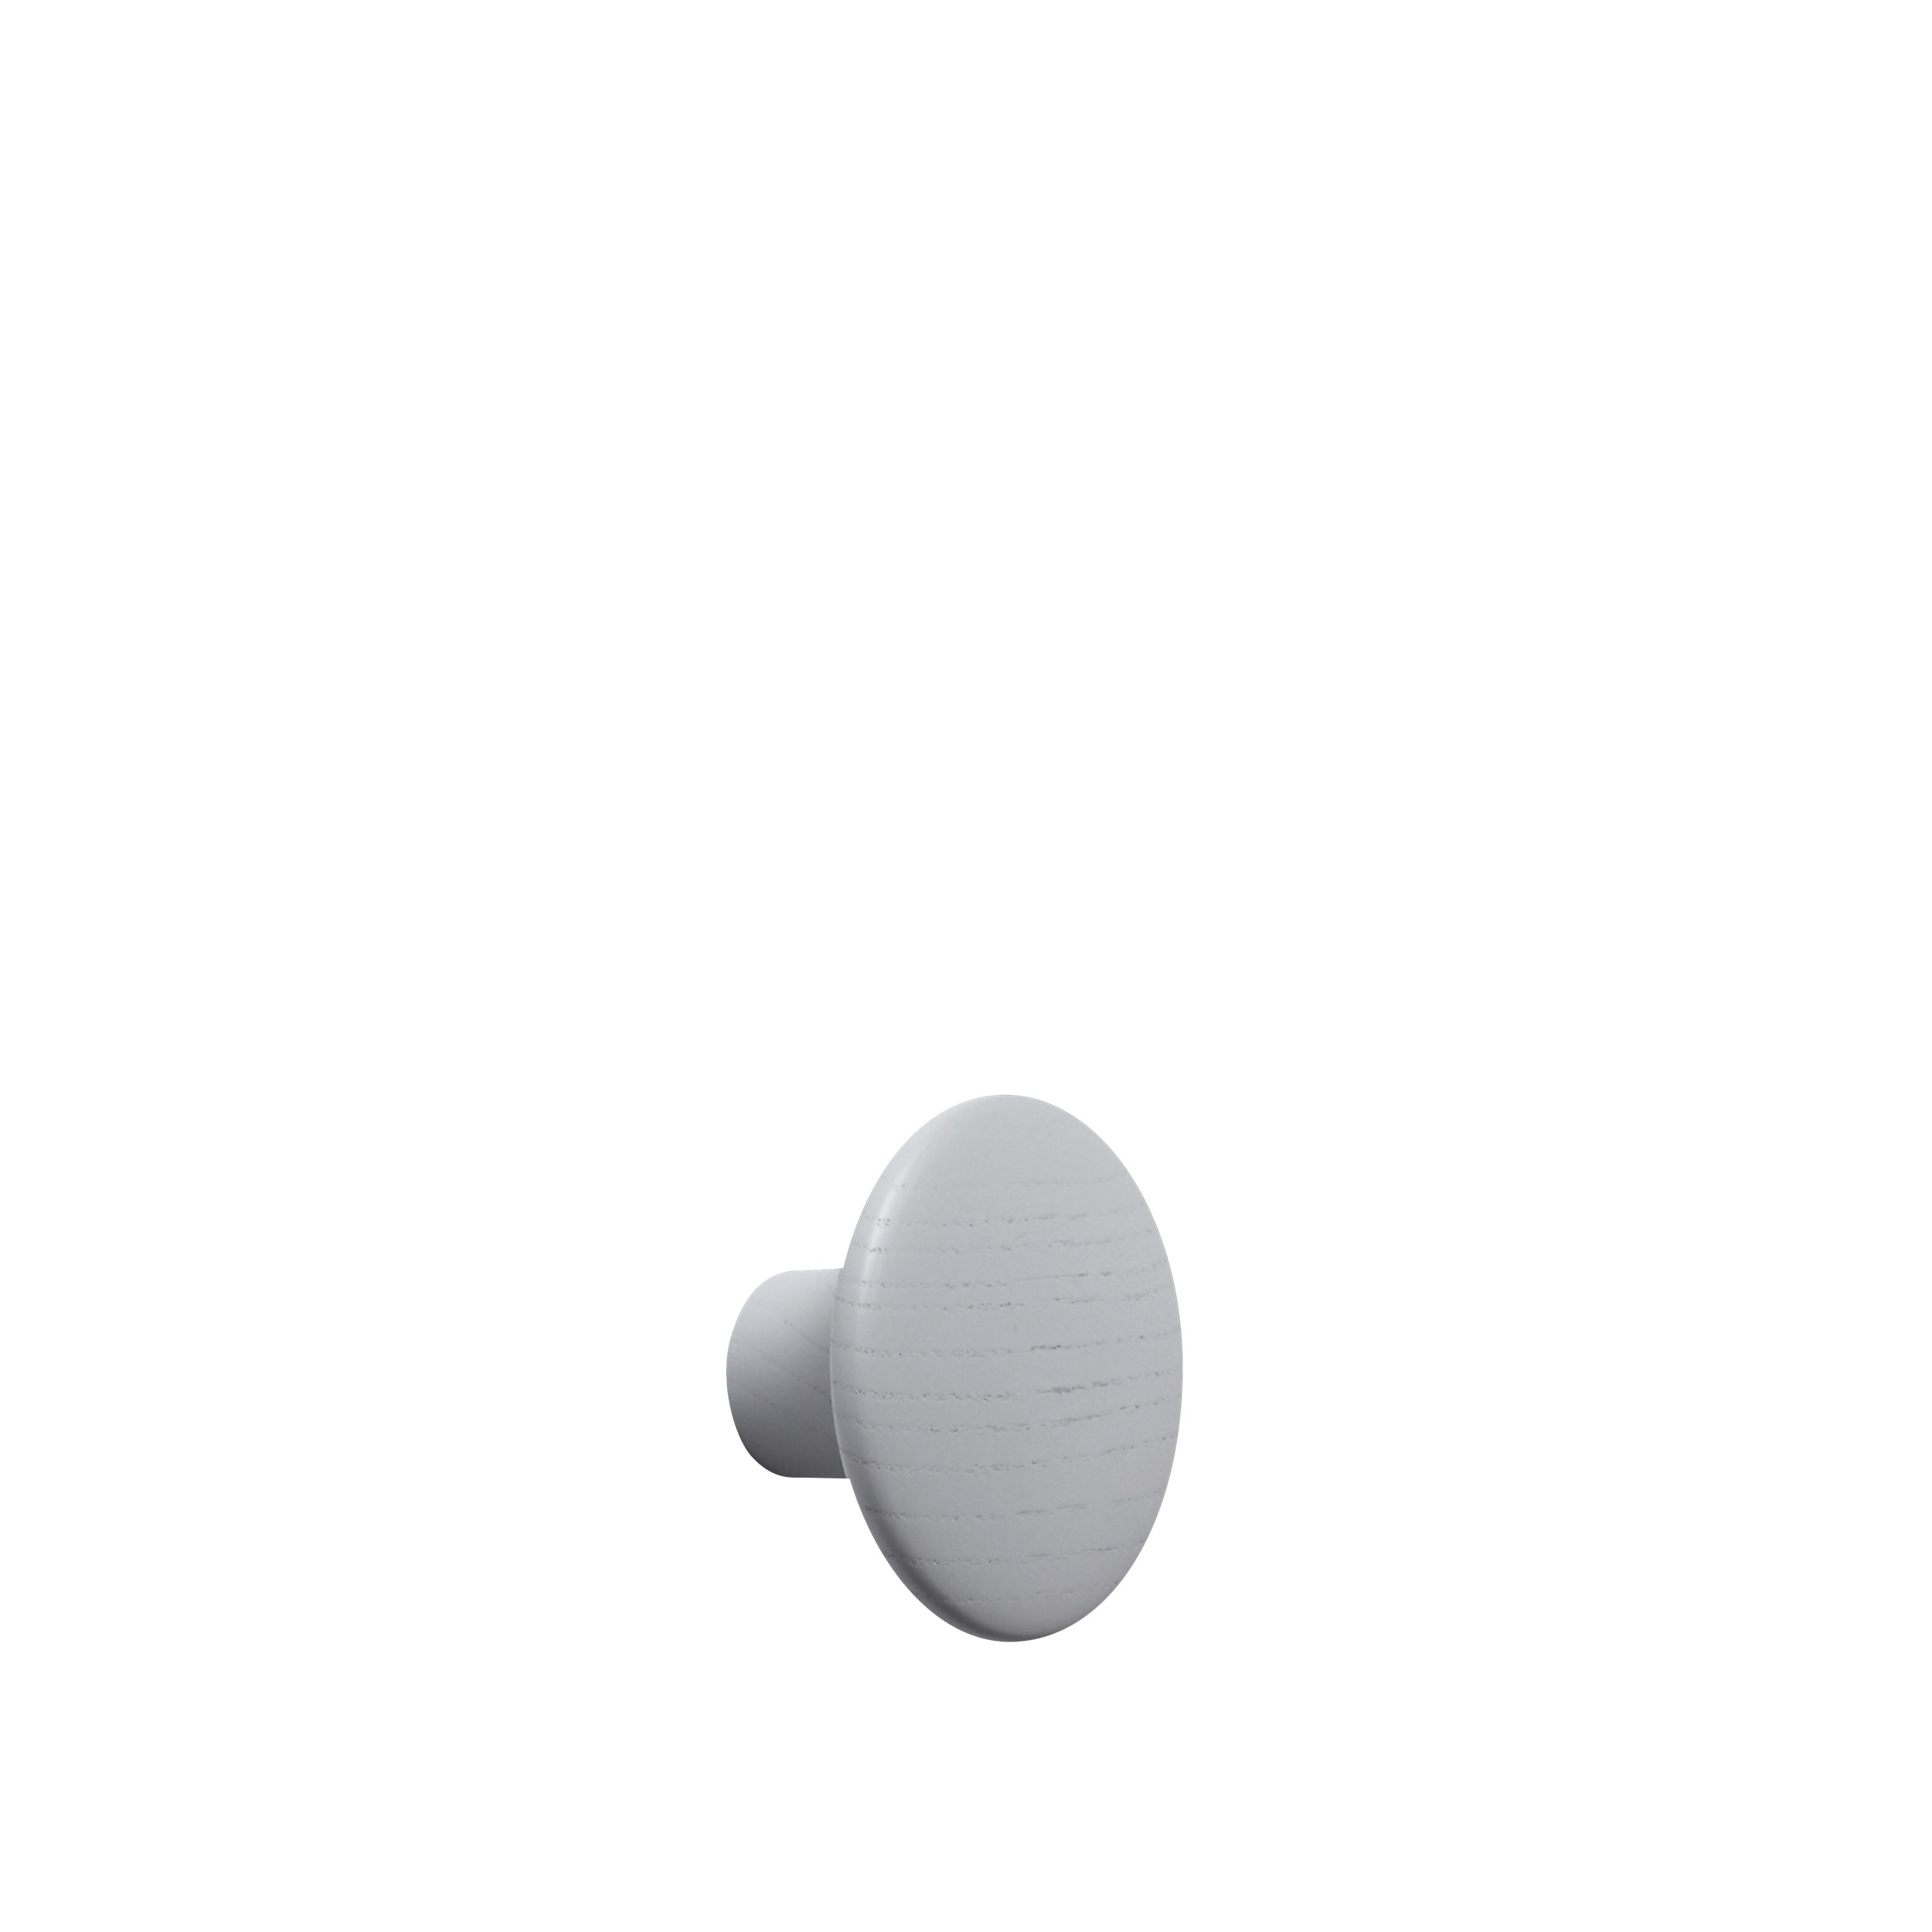 Dot wood small Ø 9 cm grey